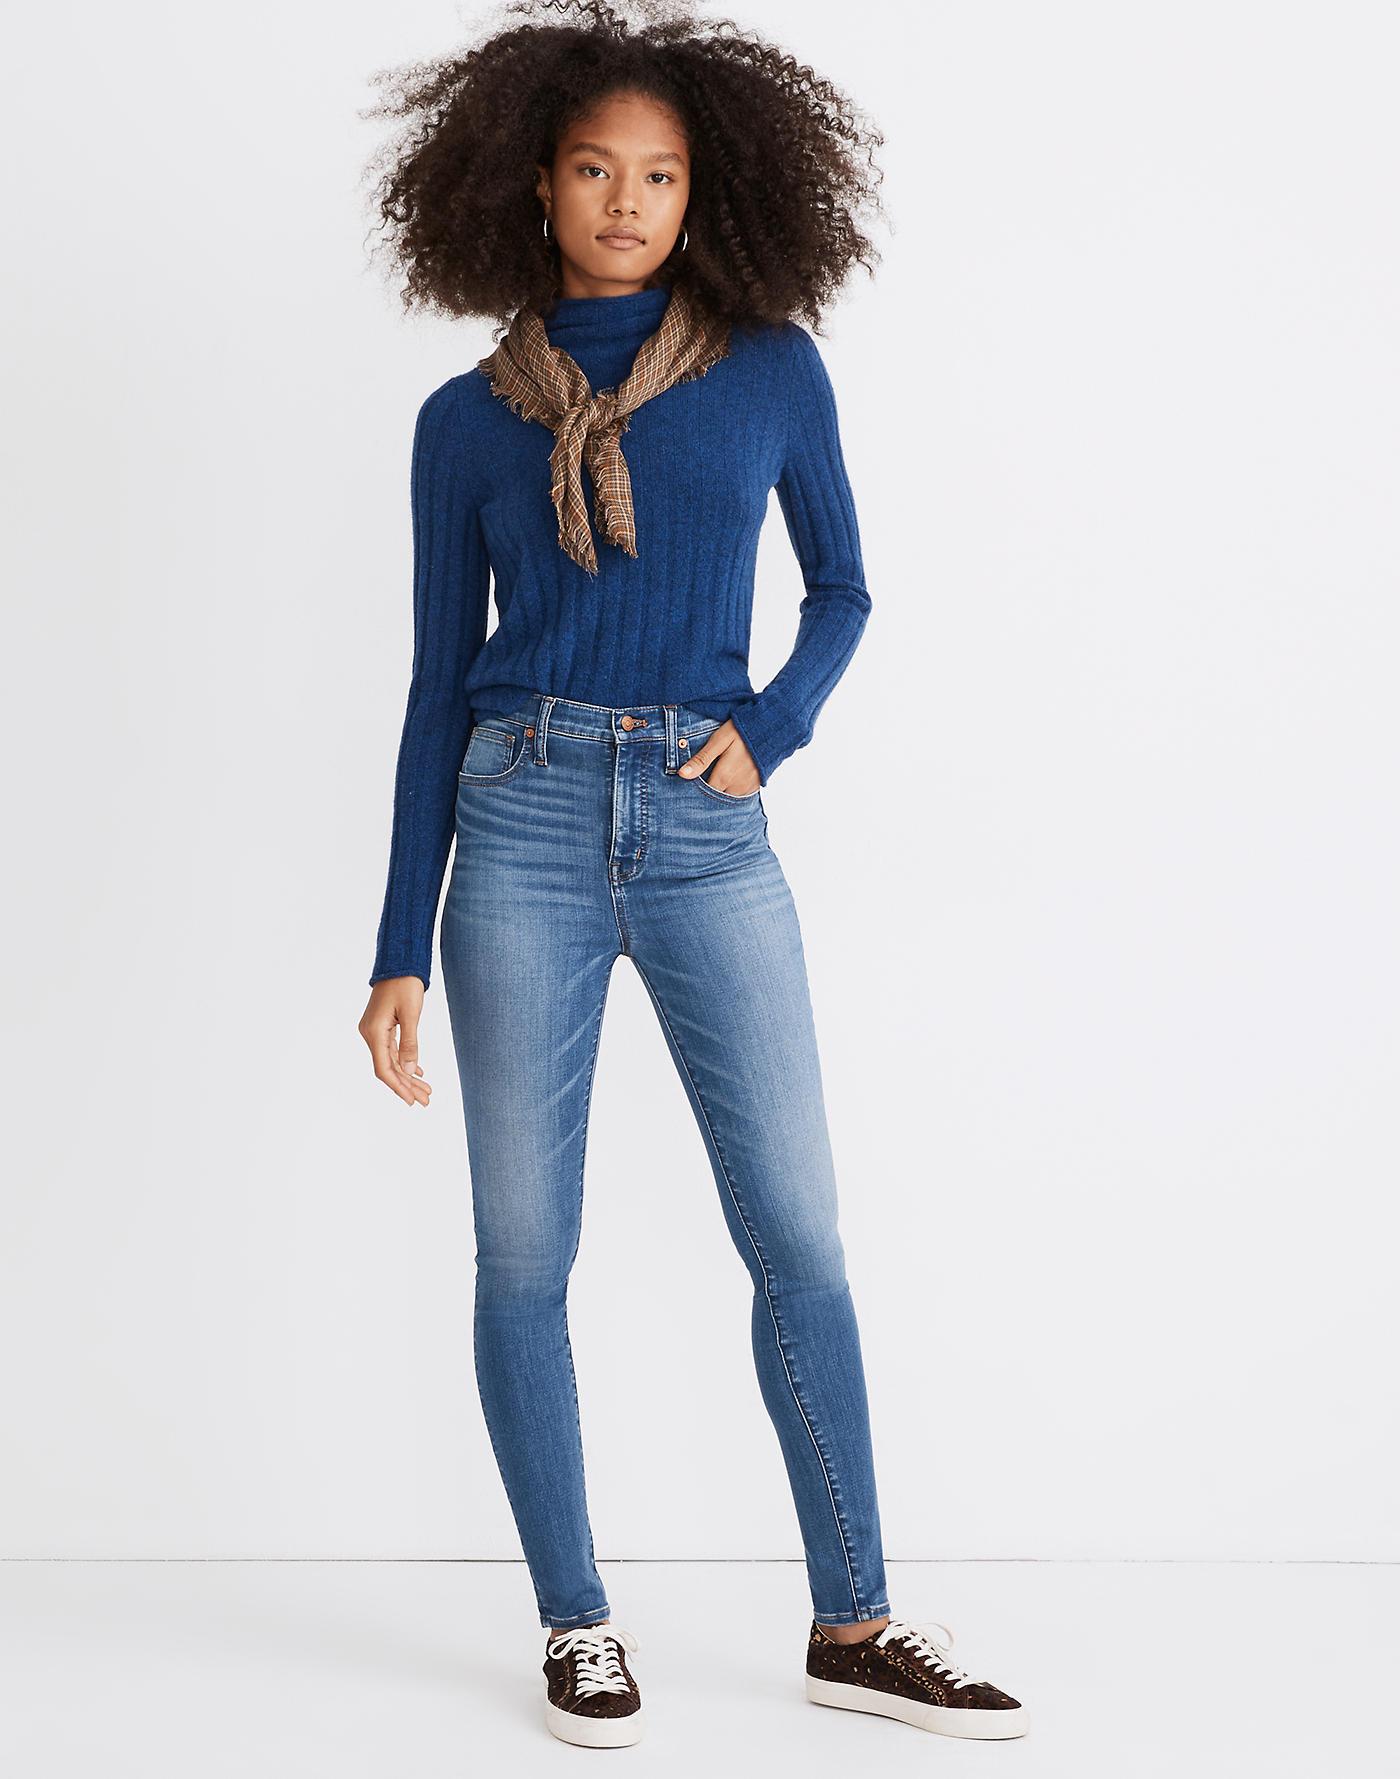 Madewell 11 High-Rise Skinny Jeans in Layne Wash: TENCEL Denim Edition